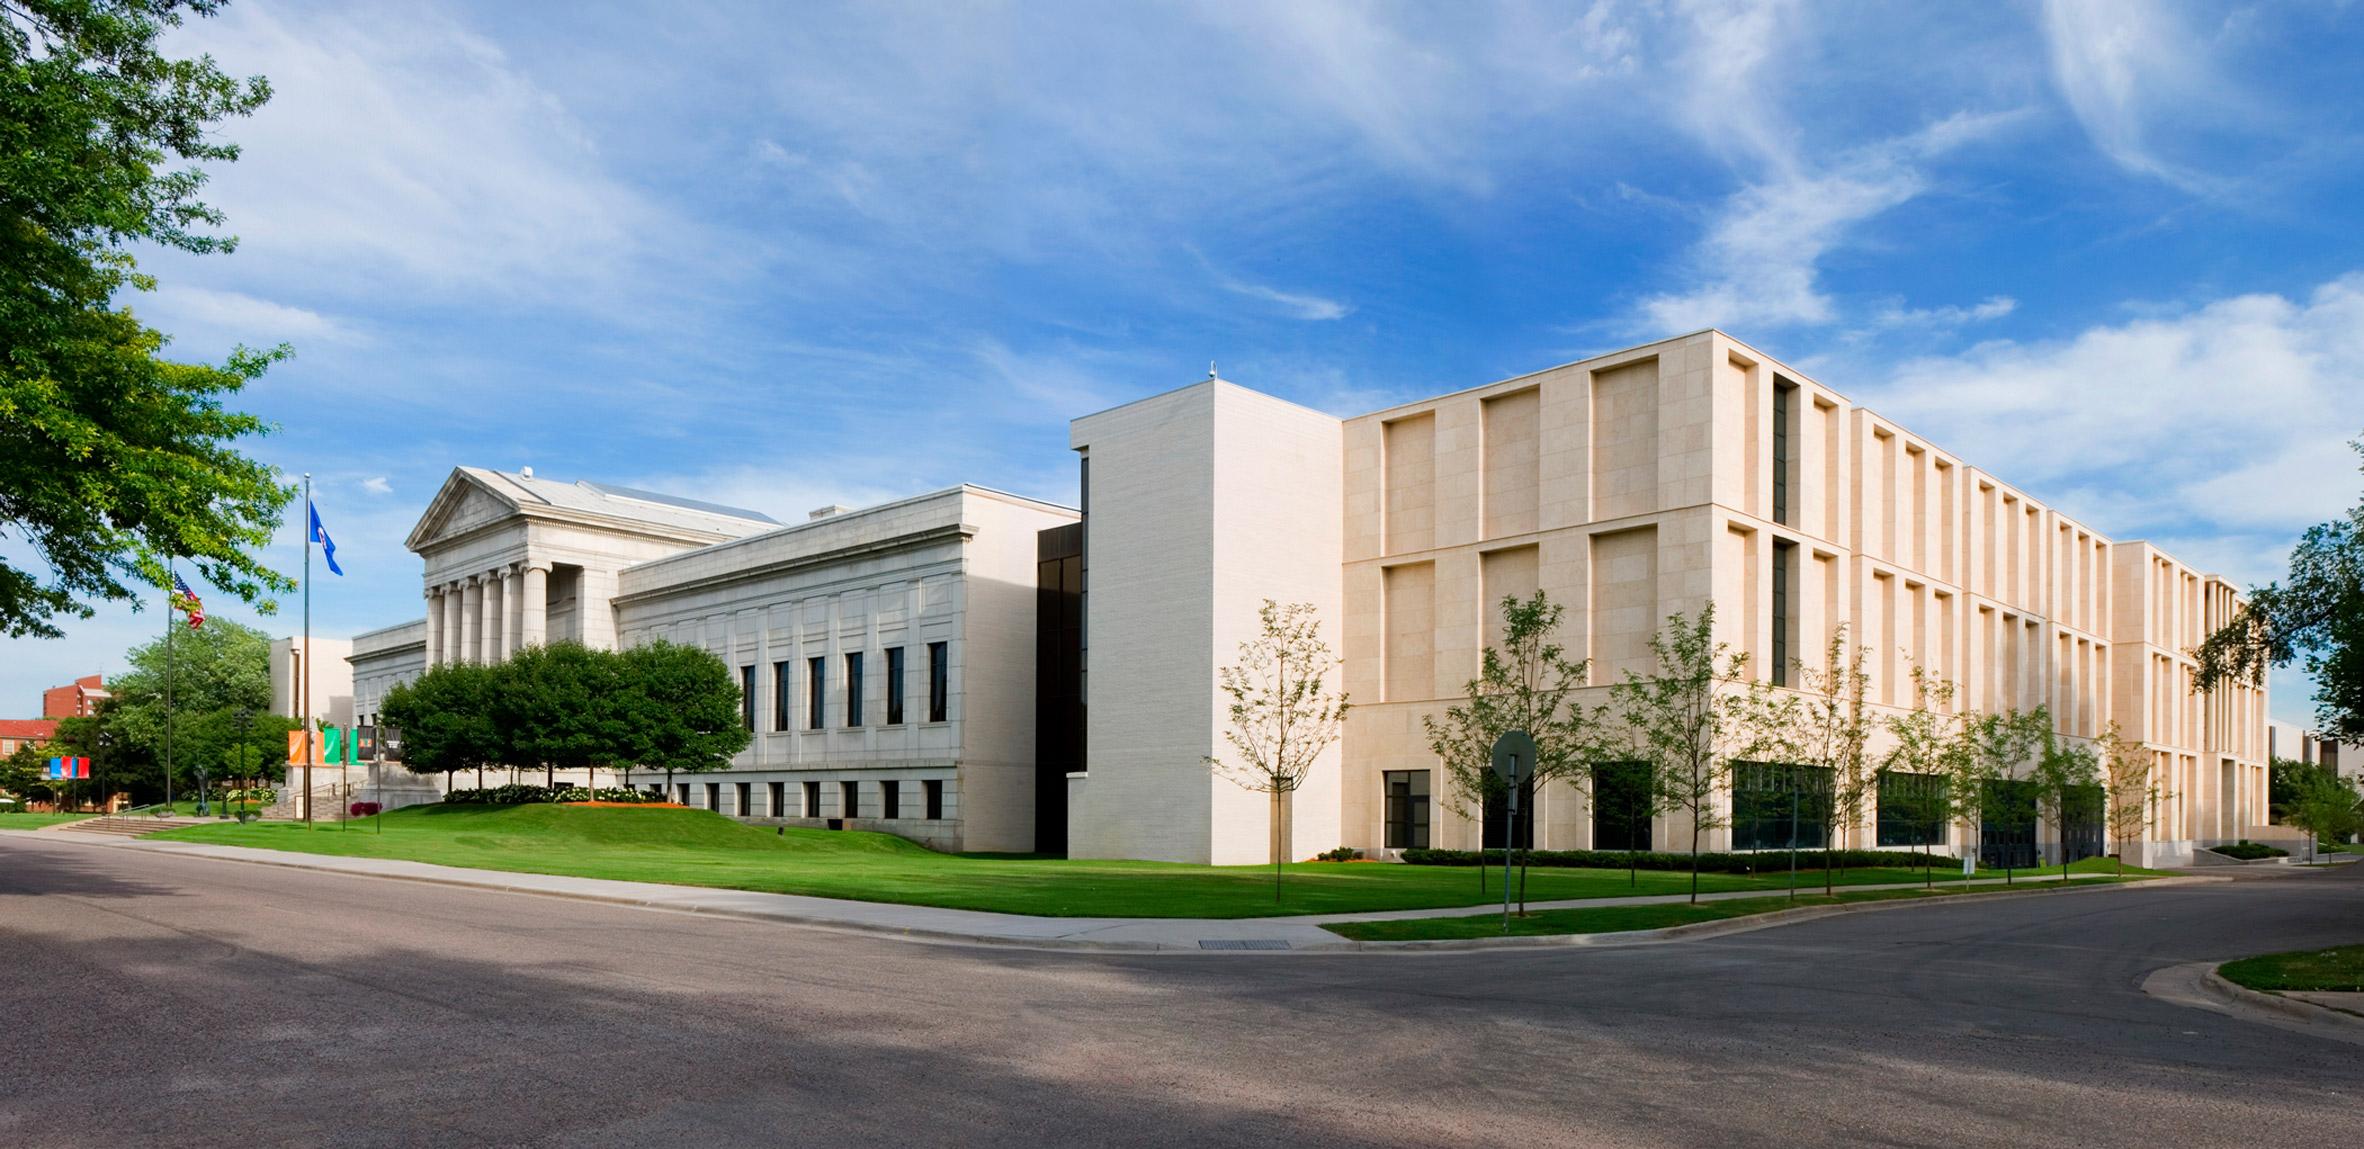 David Chipperfield to masterplan overhaul of Minneapolis Institute of Art